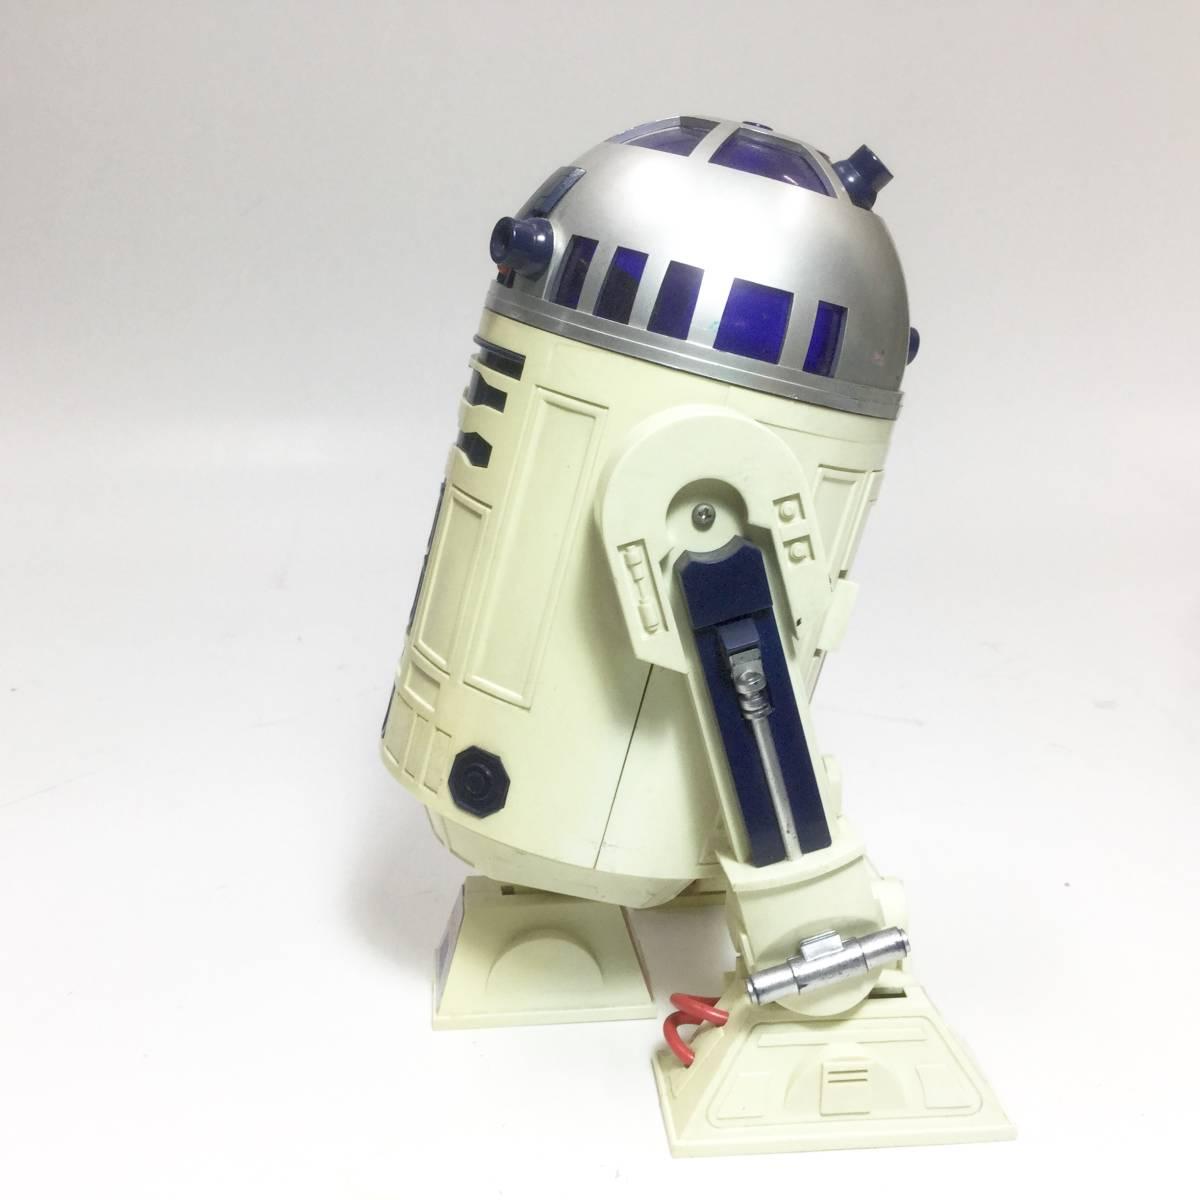 R2-D2 ラジオ 作動品 スターウォーズ 1977年版 コカコーラ 懸賞品 非売品 レトロ ビンテージ _画像5